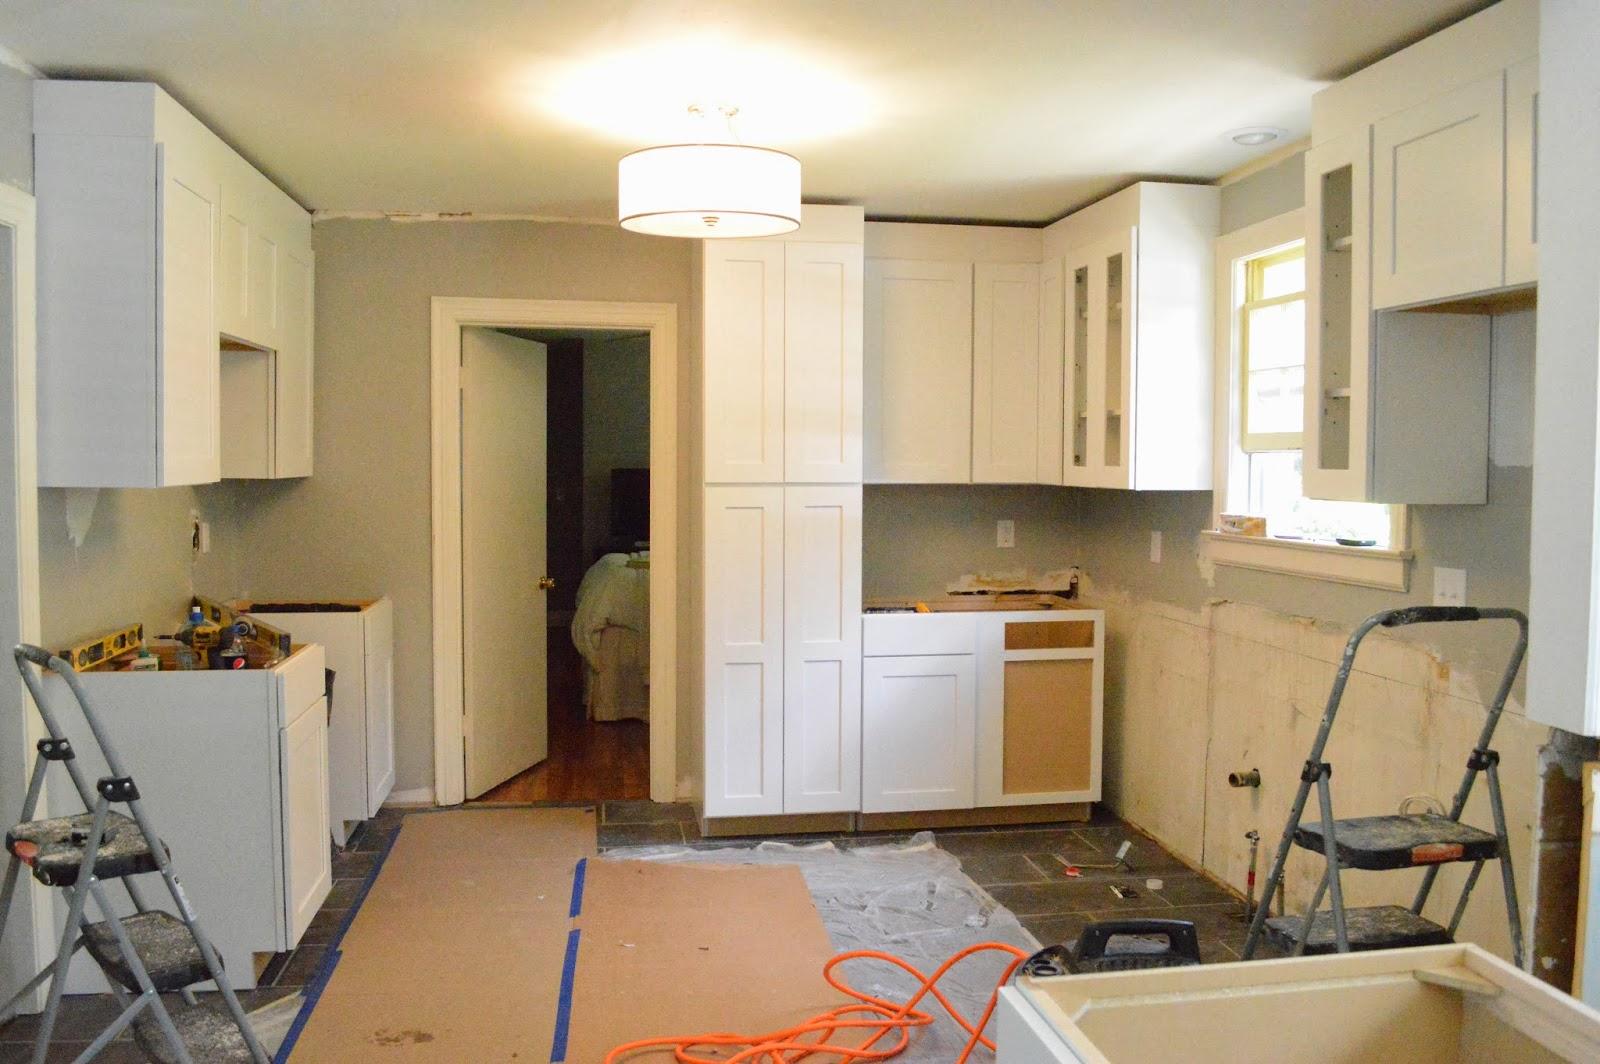 Kitchen Renovation: Cabi& Appliance Install